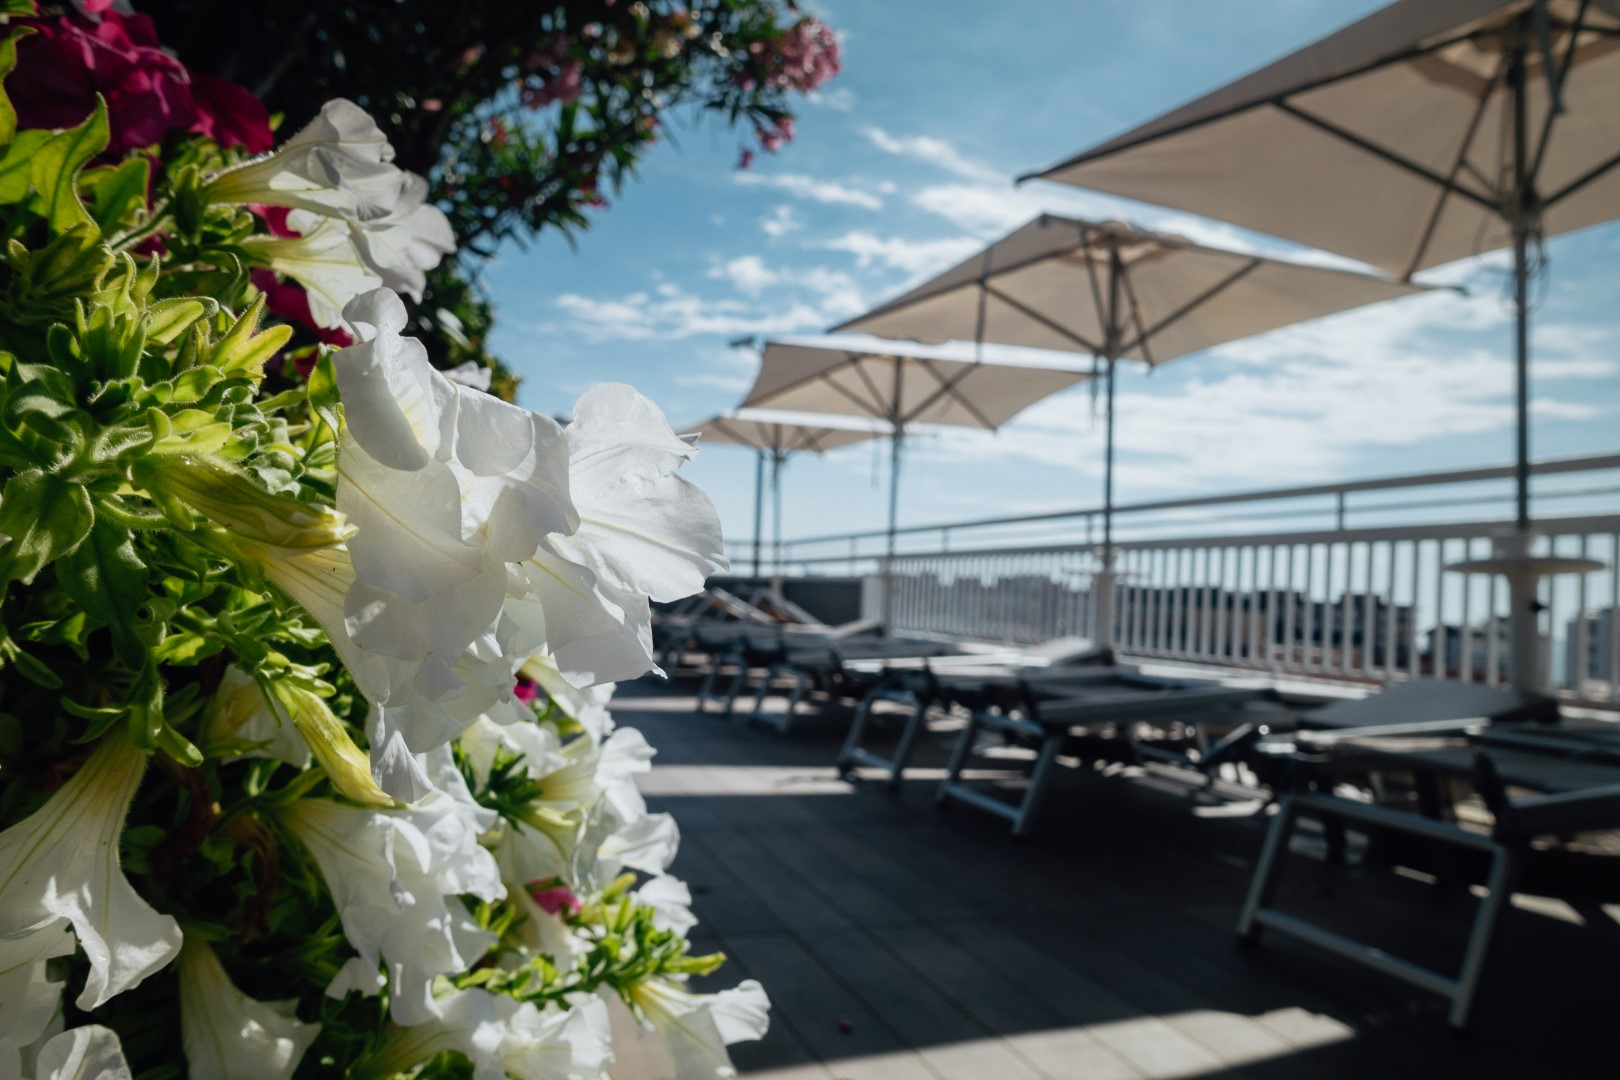 Piscina Albergo piscine Hotel Principe Palace a Jesolo Lido VE Piazza Mazzini